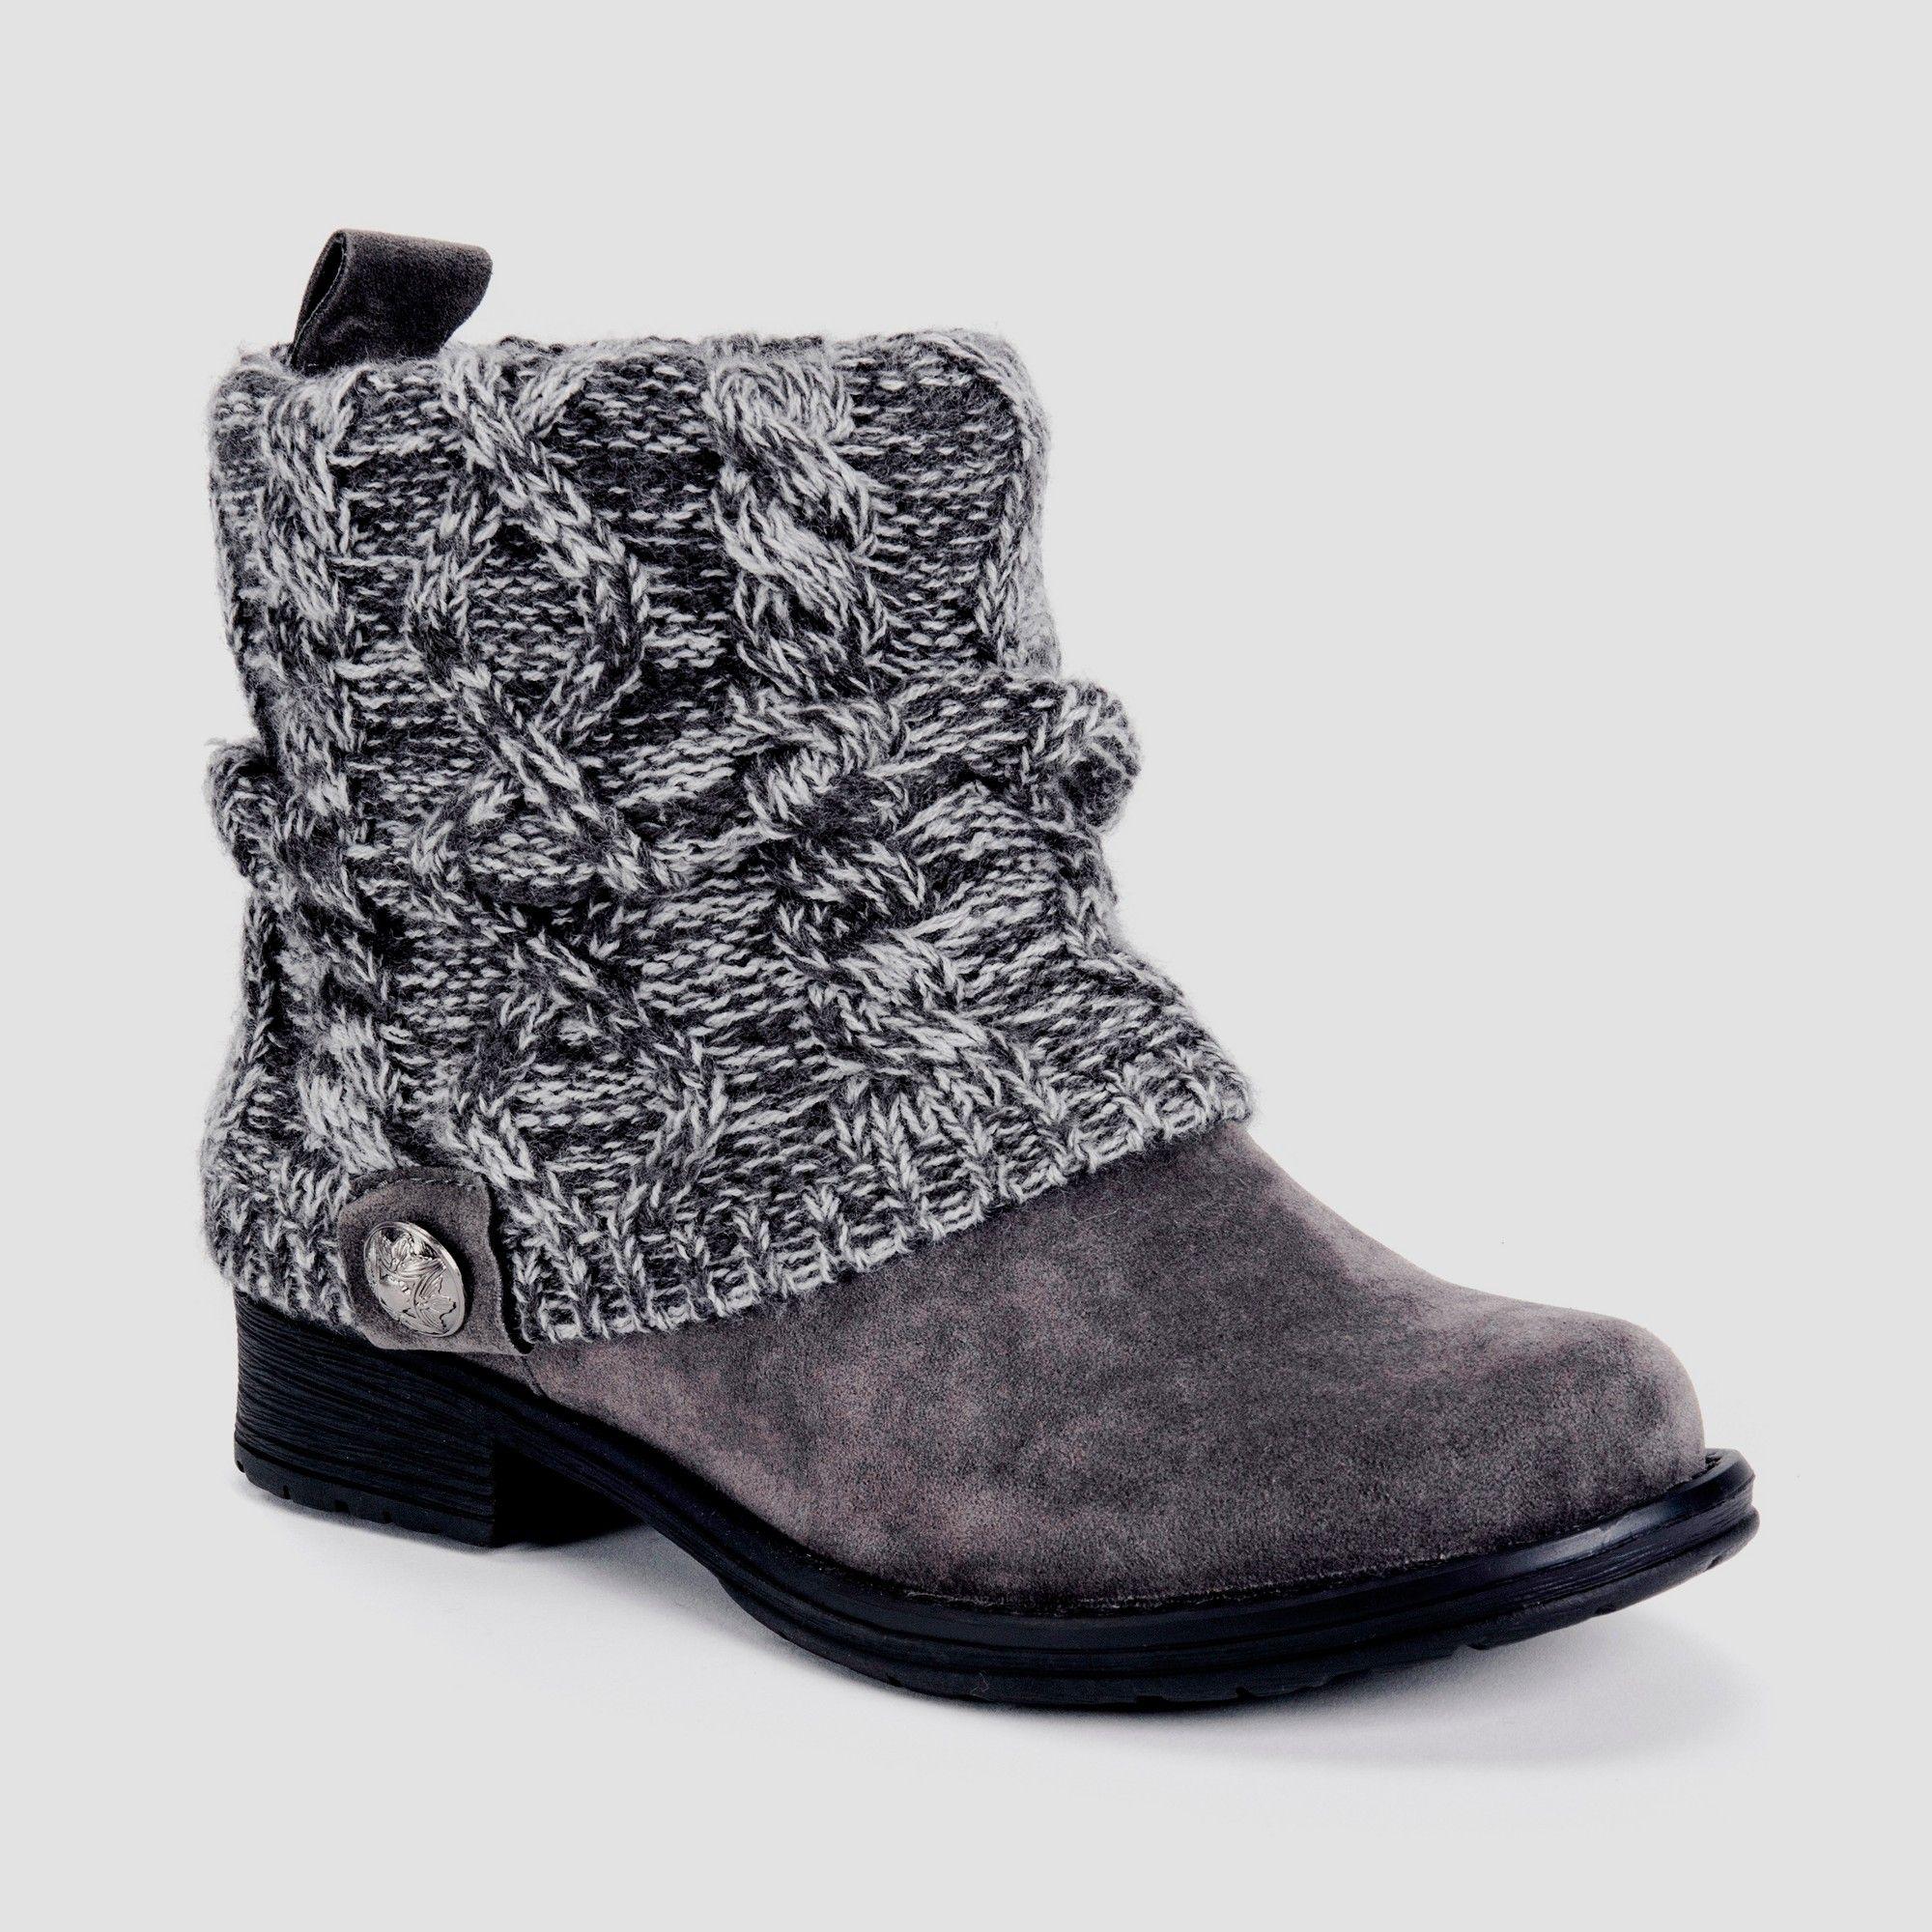 b64ce95cc3cb Women s Muk Luks Patrice Shearling Style Boots - Grey 10